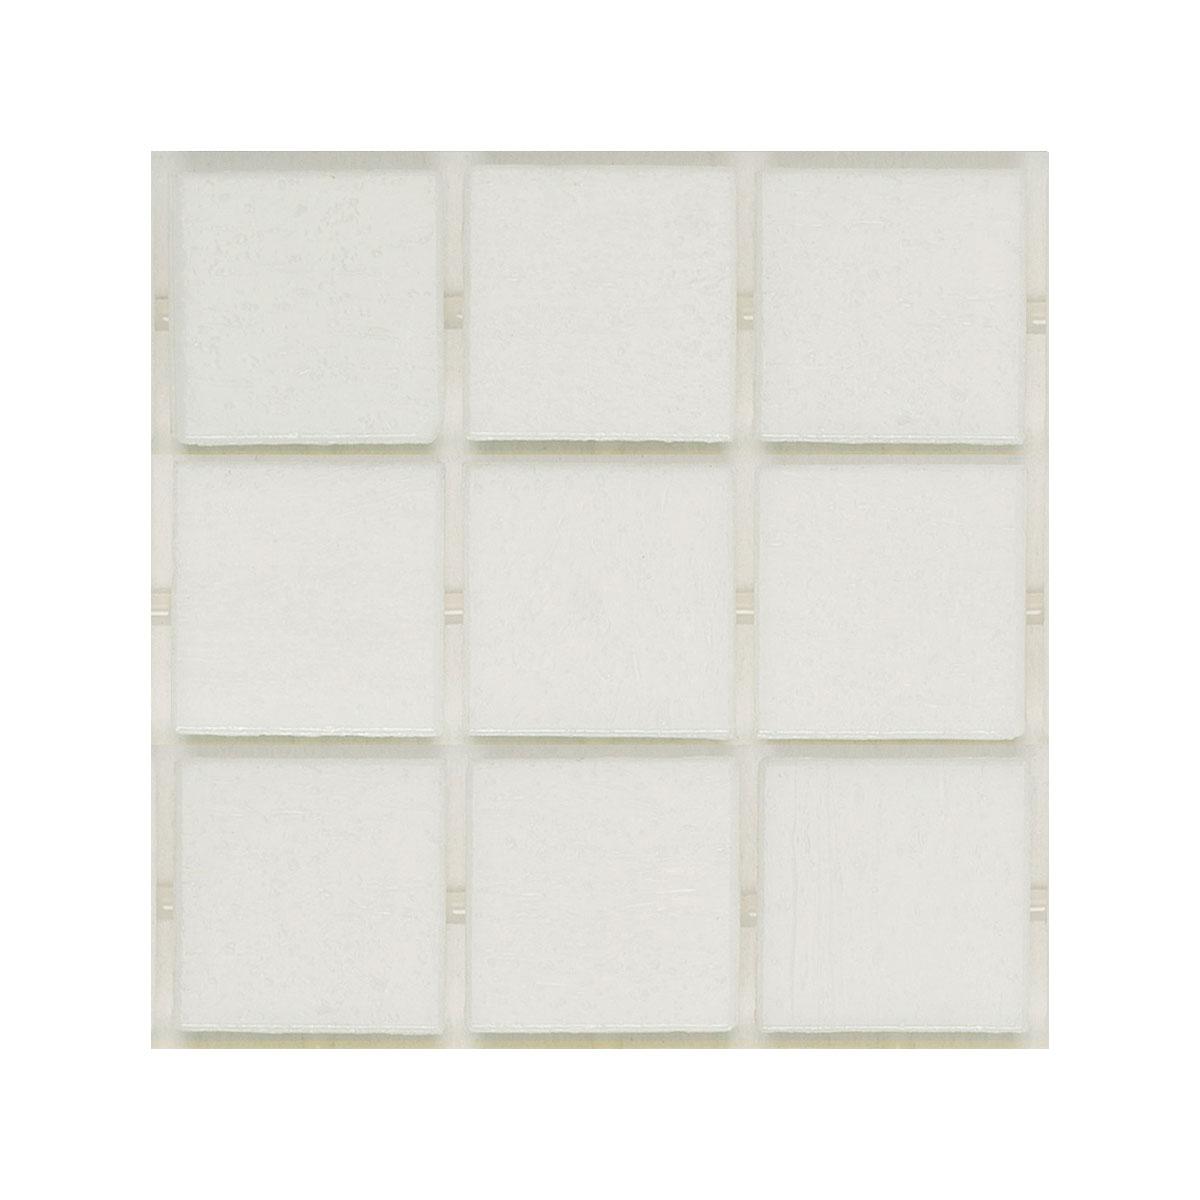 Vitreo - 160 white - mosaic feature pool tiles - Stone3 Brisbane